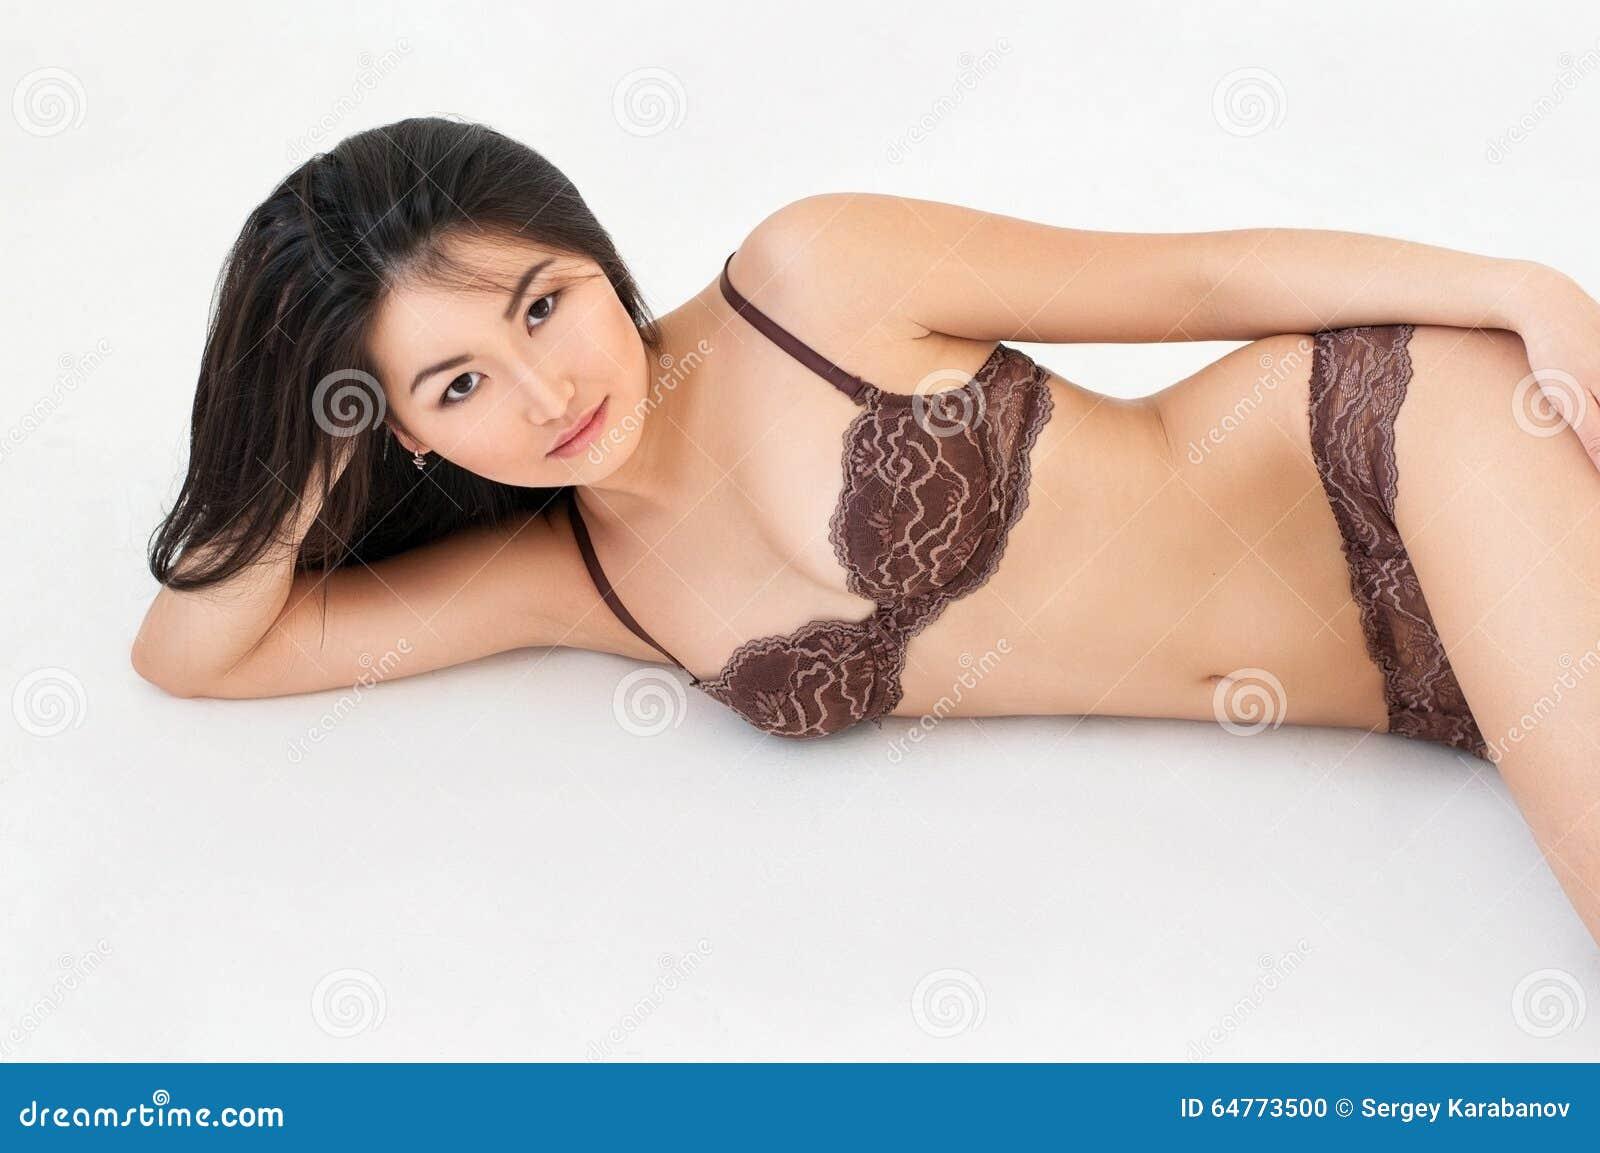 women Laundrie asian